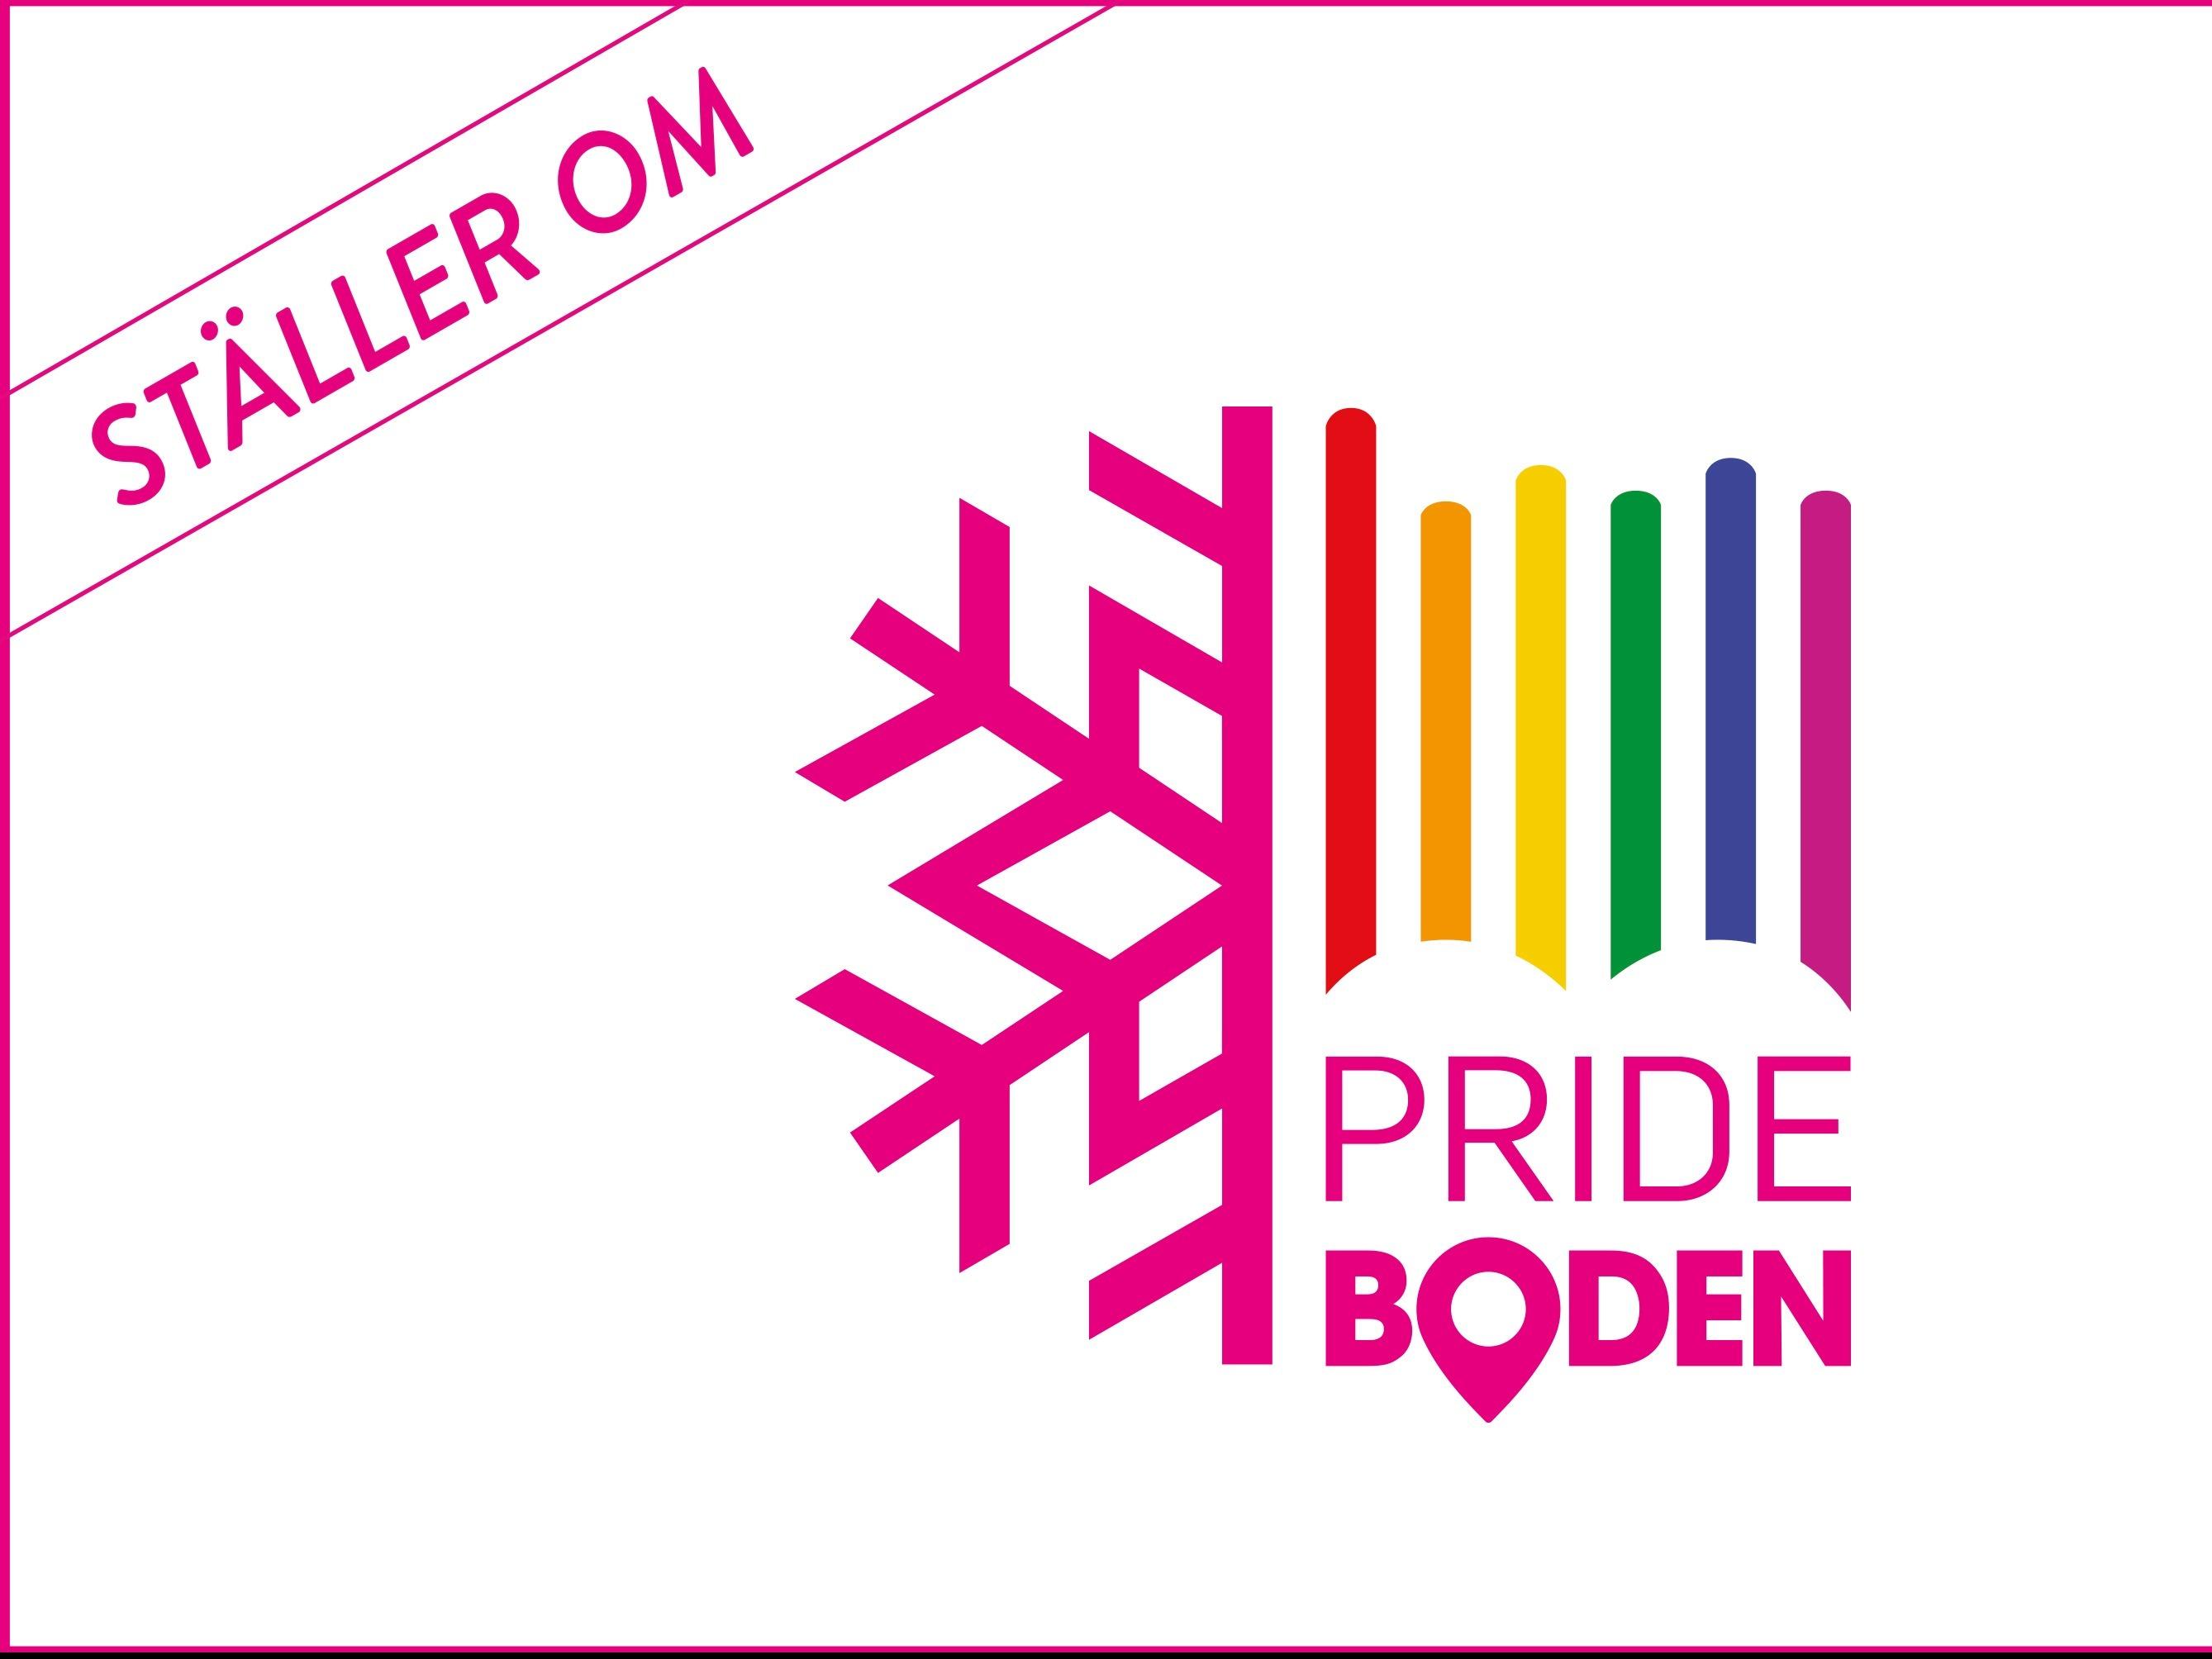 Pride boden omställd 2020